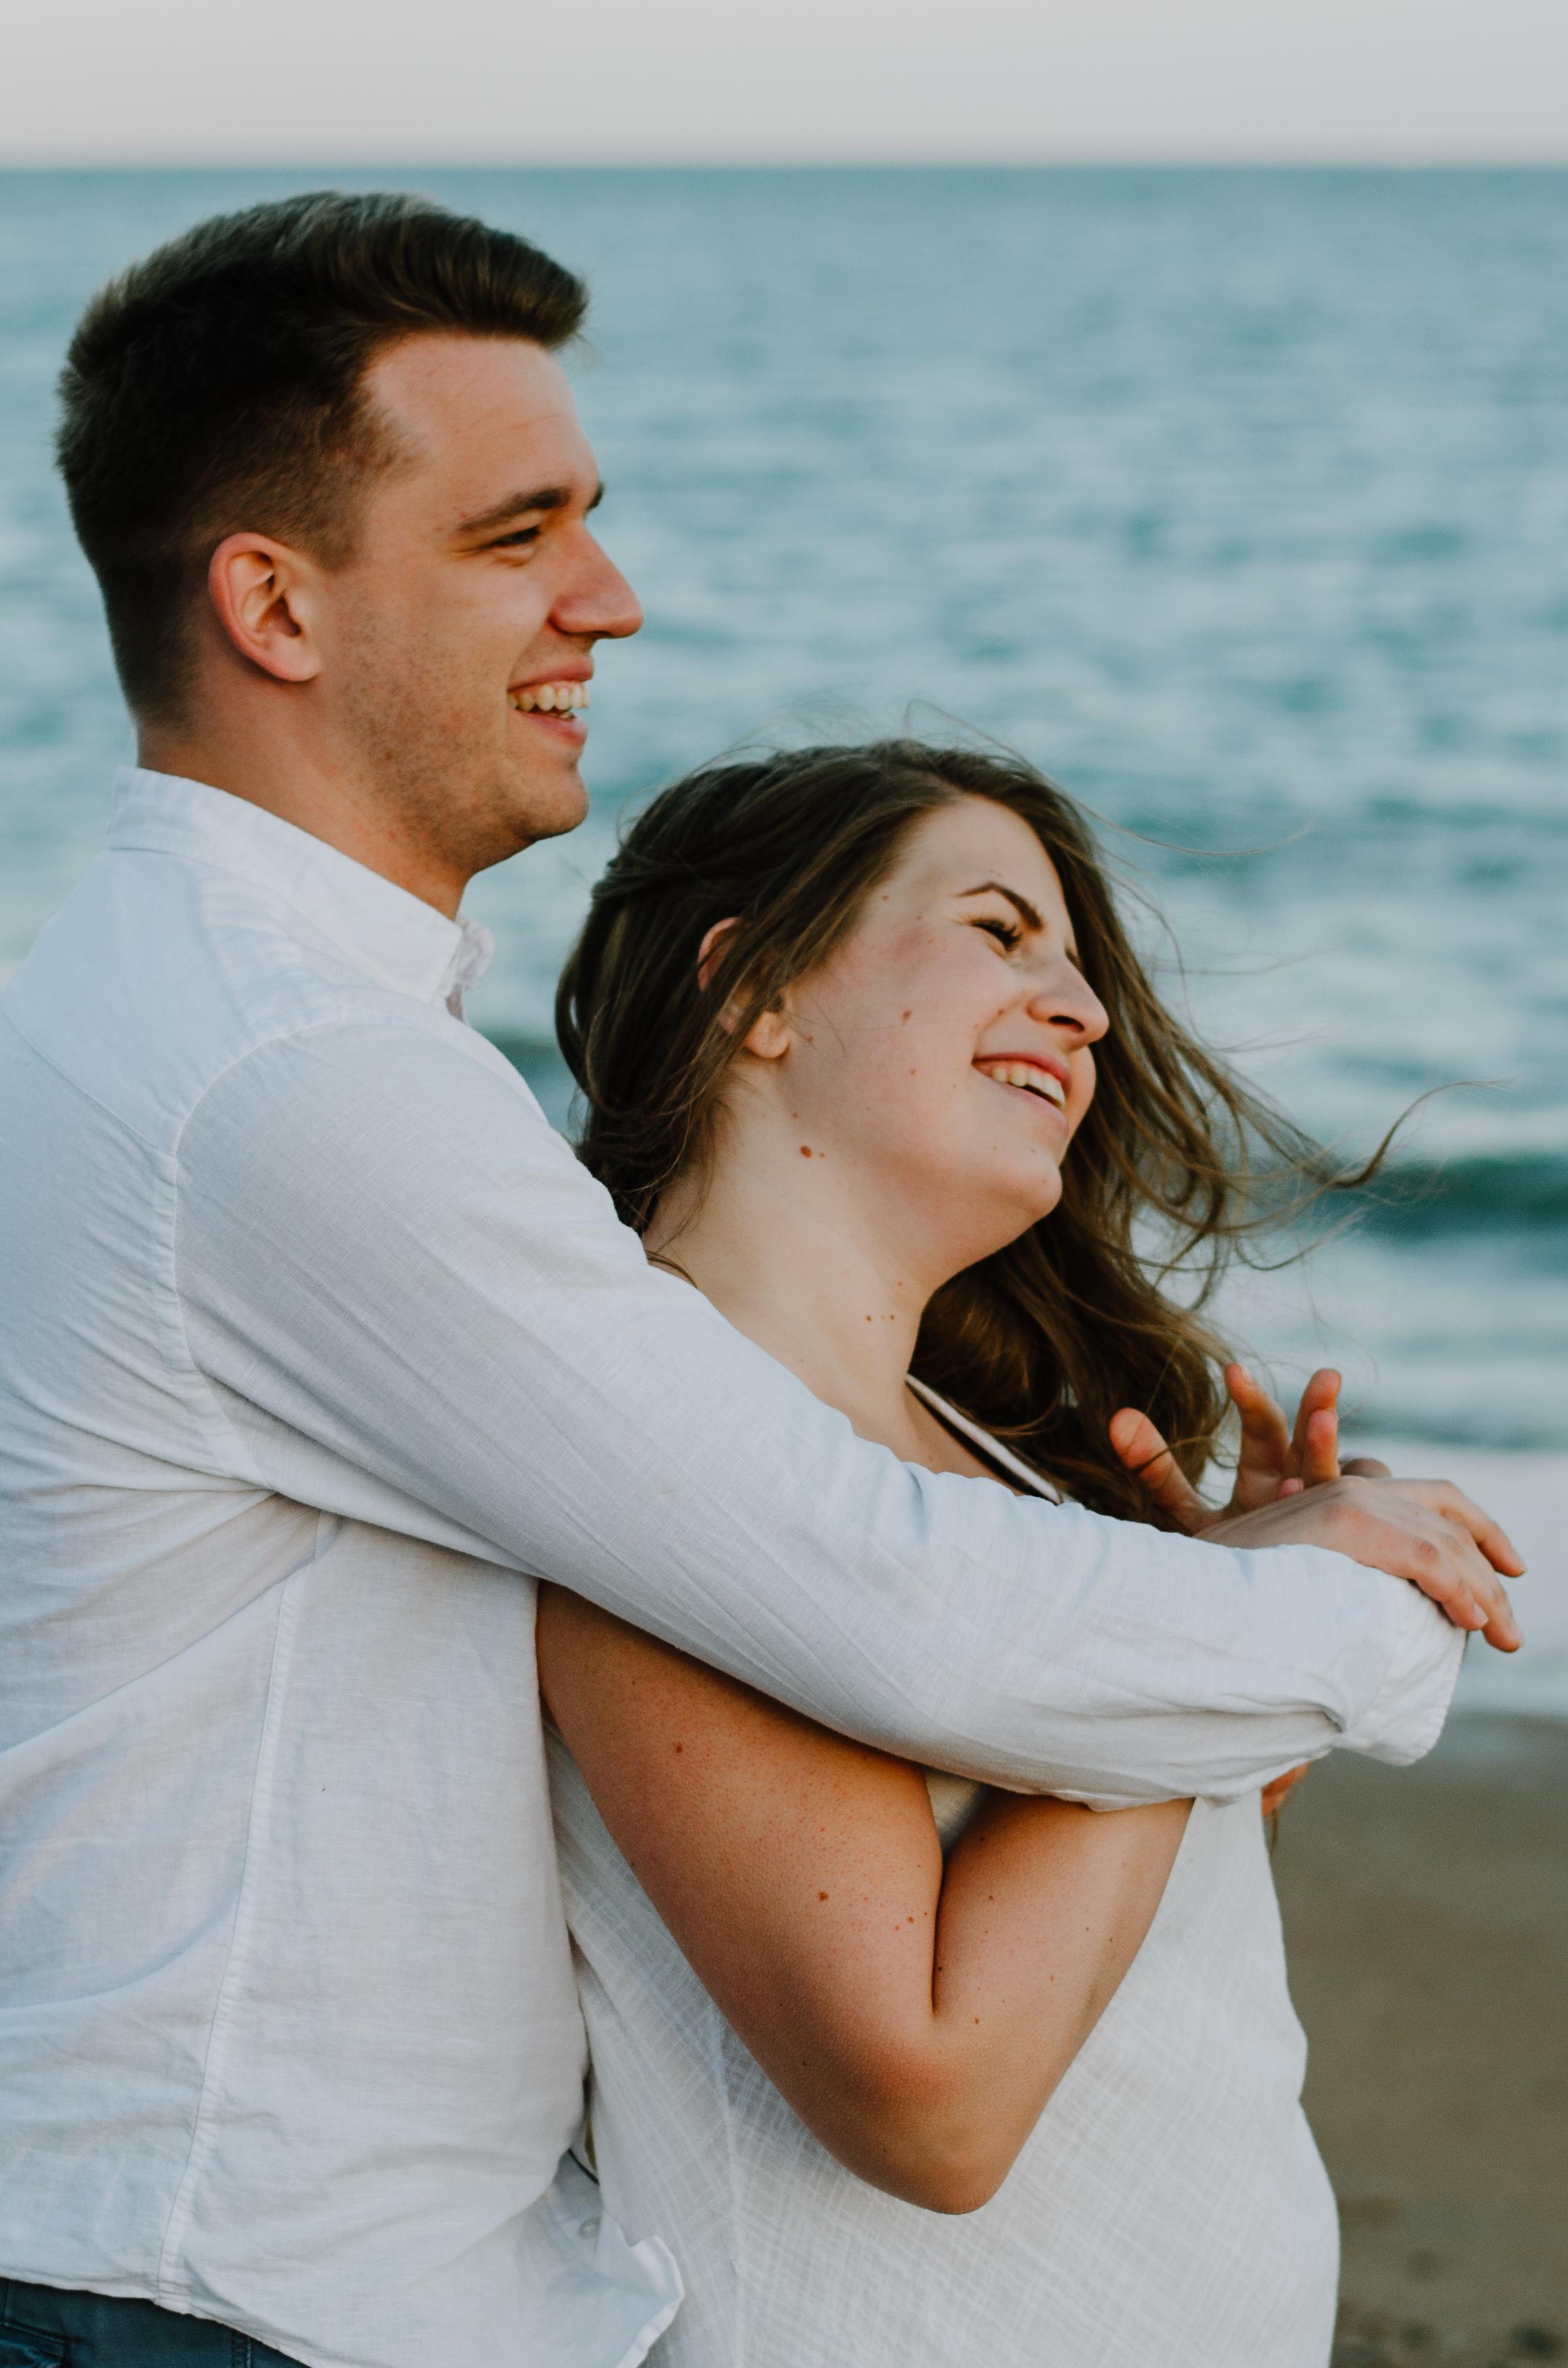 Ieva & Julius - Brighton Beach - Couple Session - Aiste Saulyte Photography-44.jpg